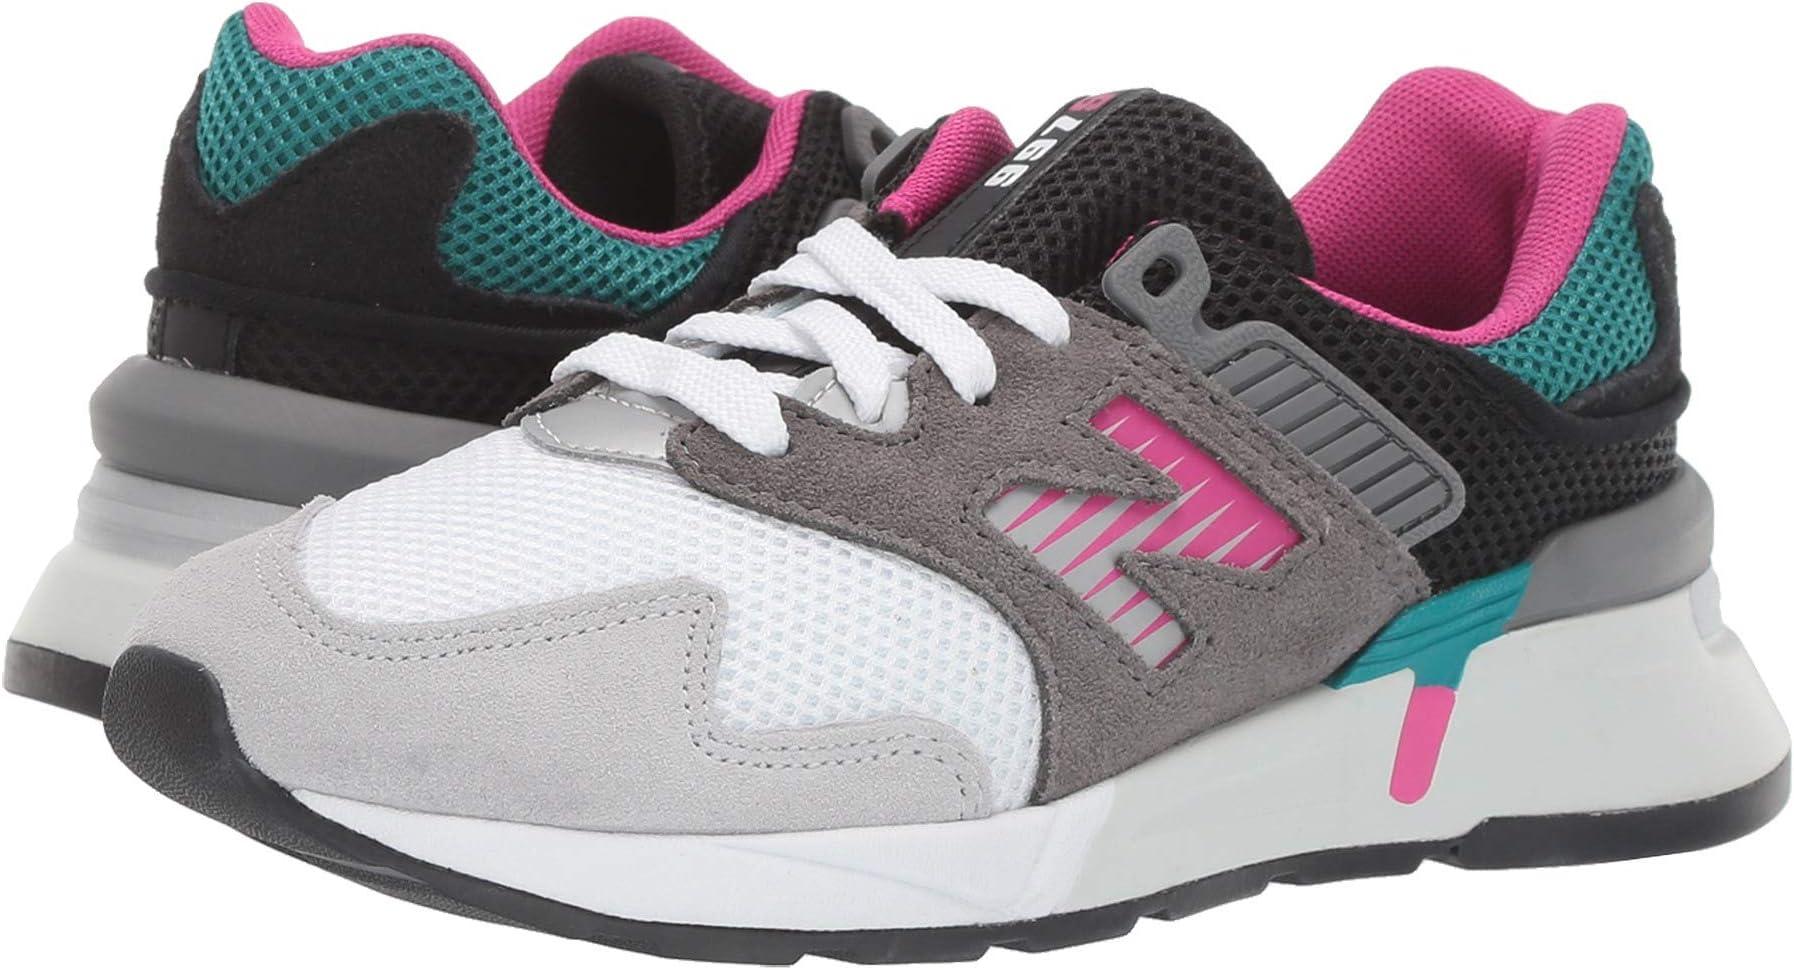 e03da8f6a1 New Balance Shoes, Clothing, Activewear, Socks | Zappos.com